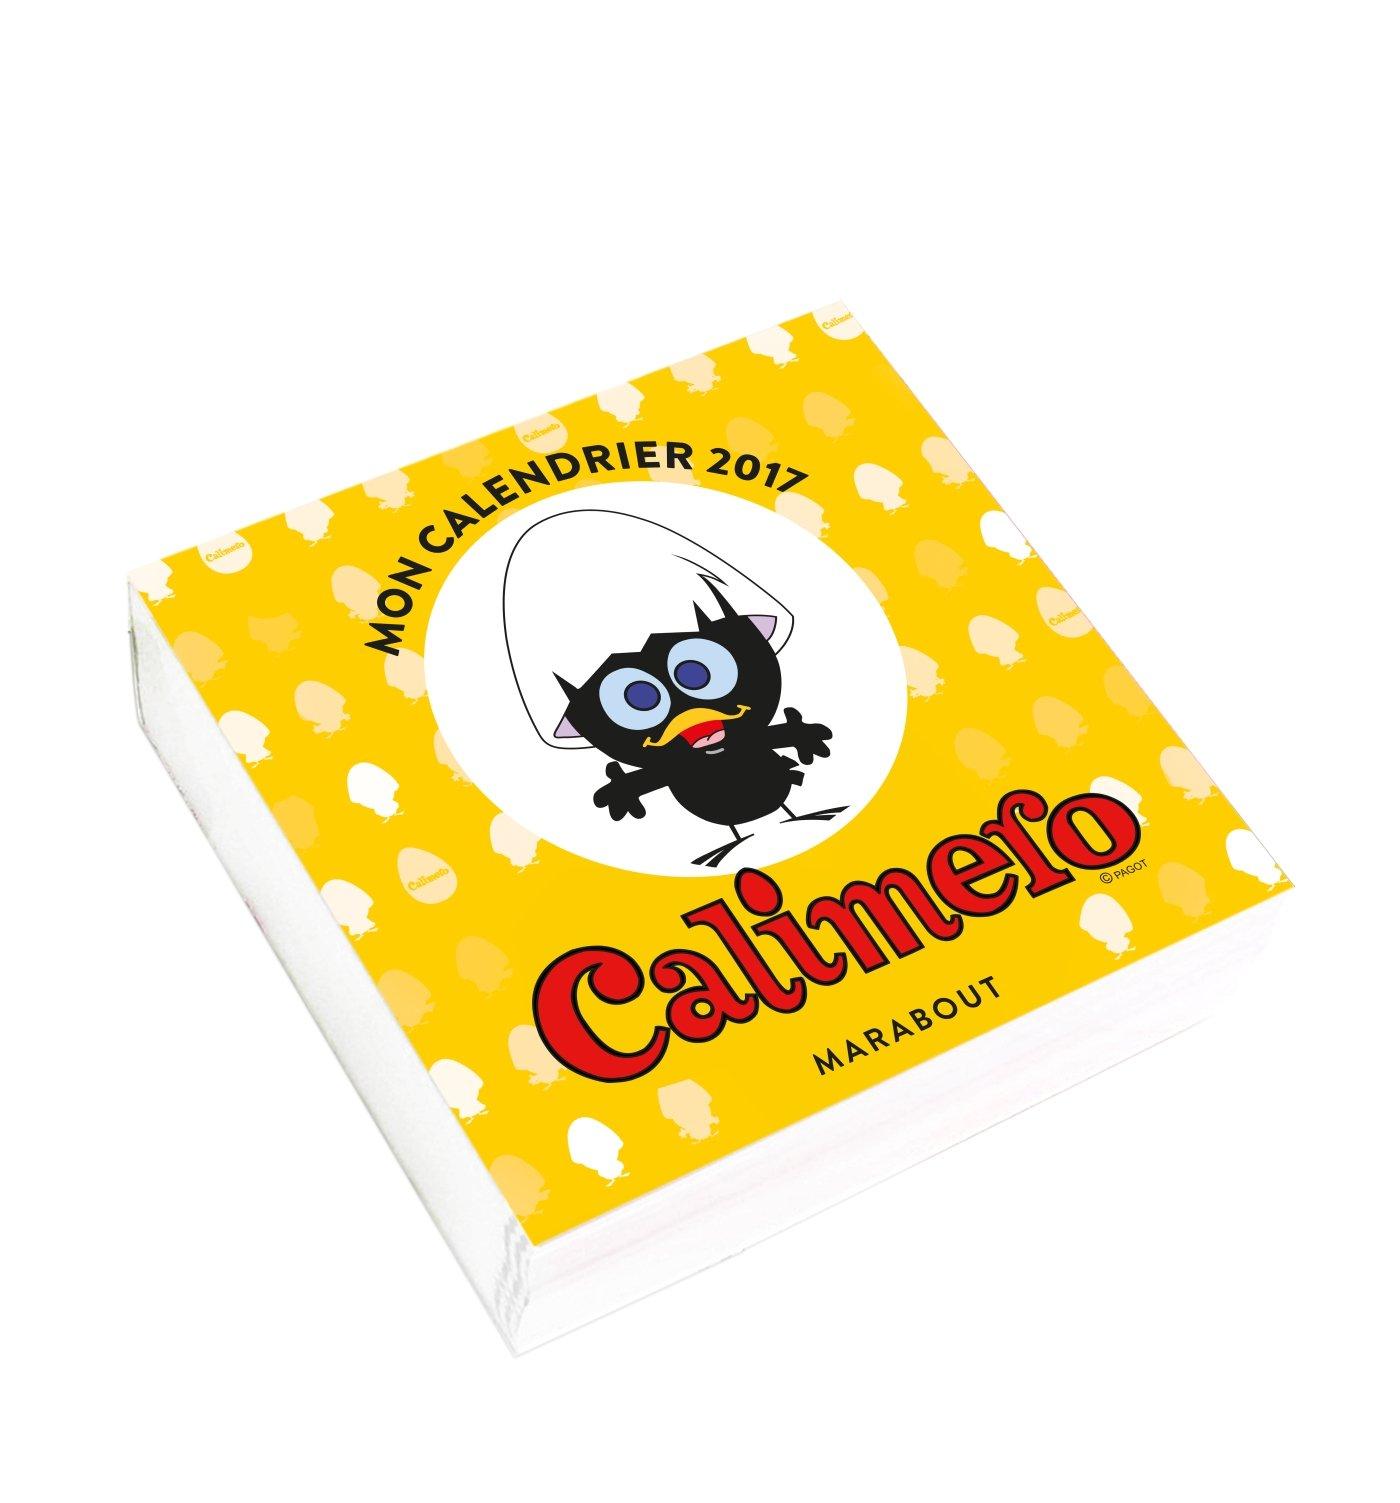 Extrêmement Amazon.fr - Mug Cake Calimero - Collectif - Livres YR18